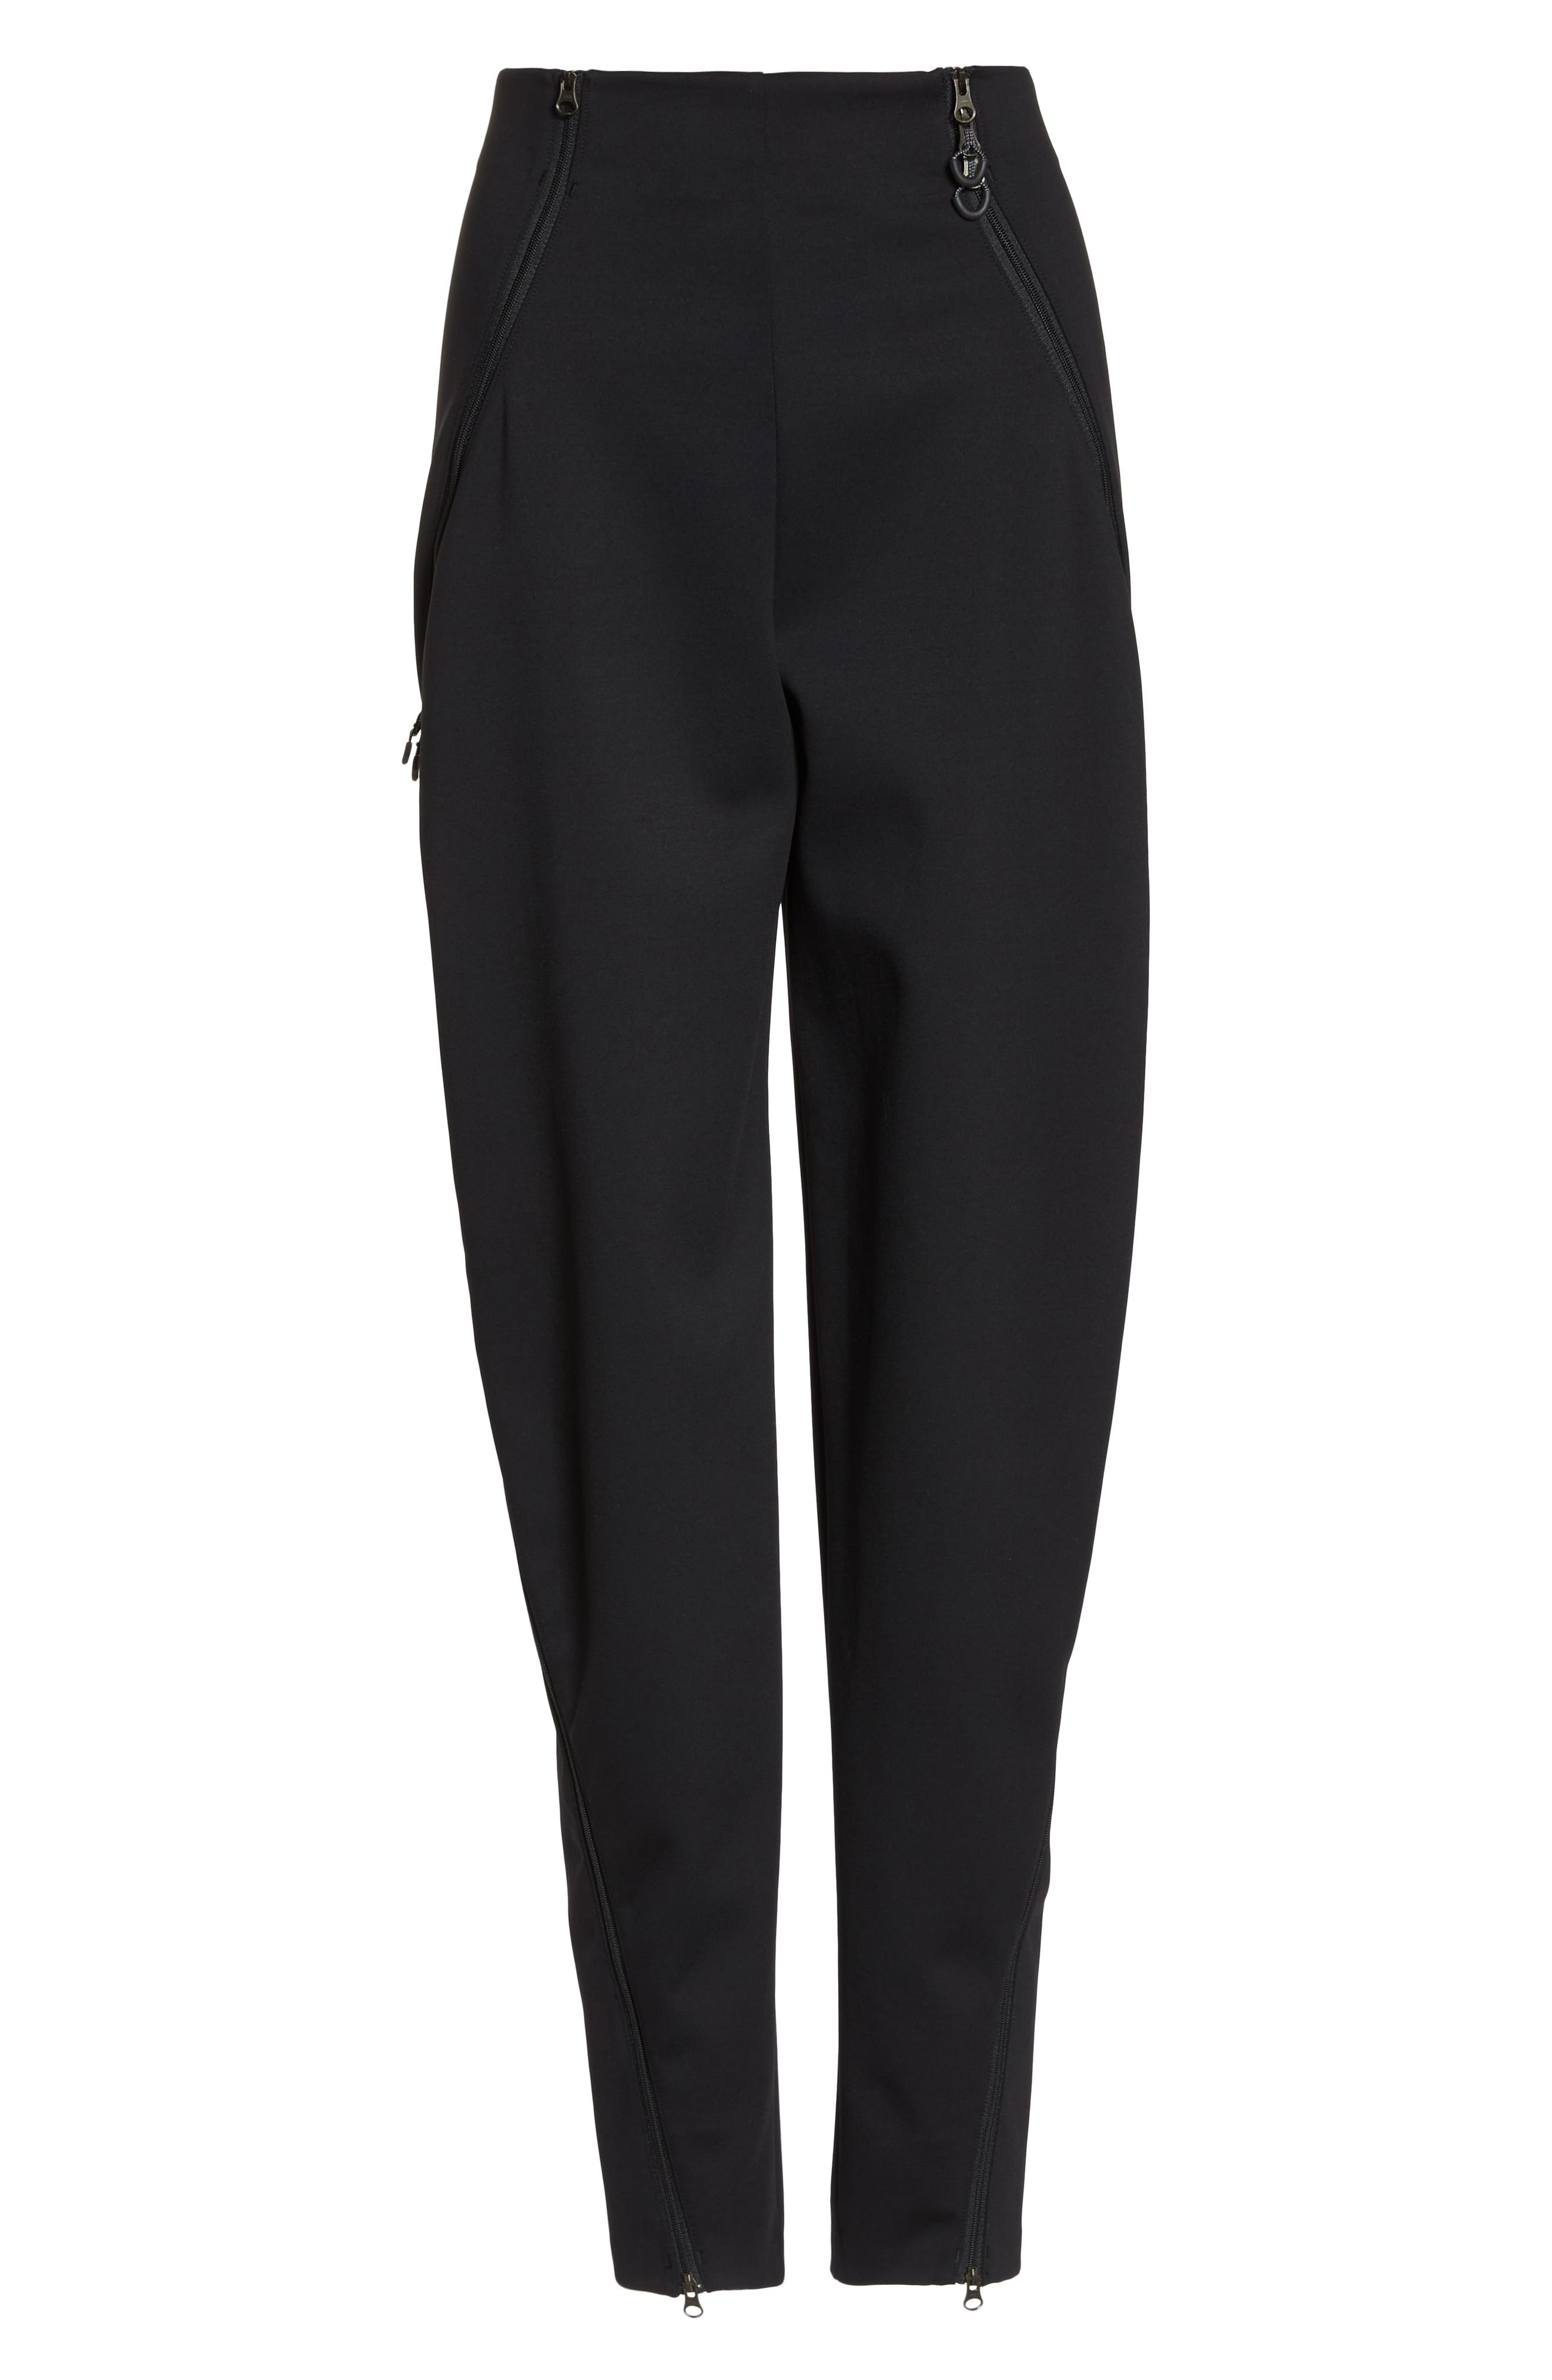 XX Project Women's Dri-FIT Training Pants,                             Alternate thumbnail 6, color,                             BLACK